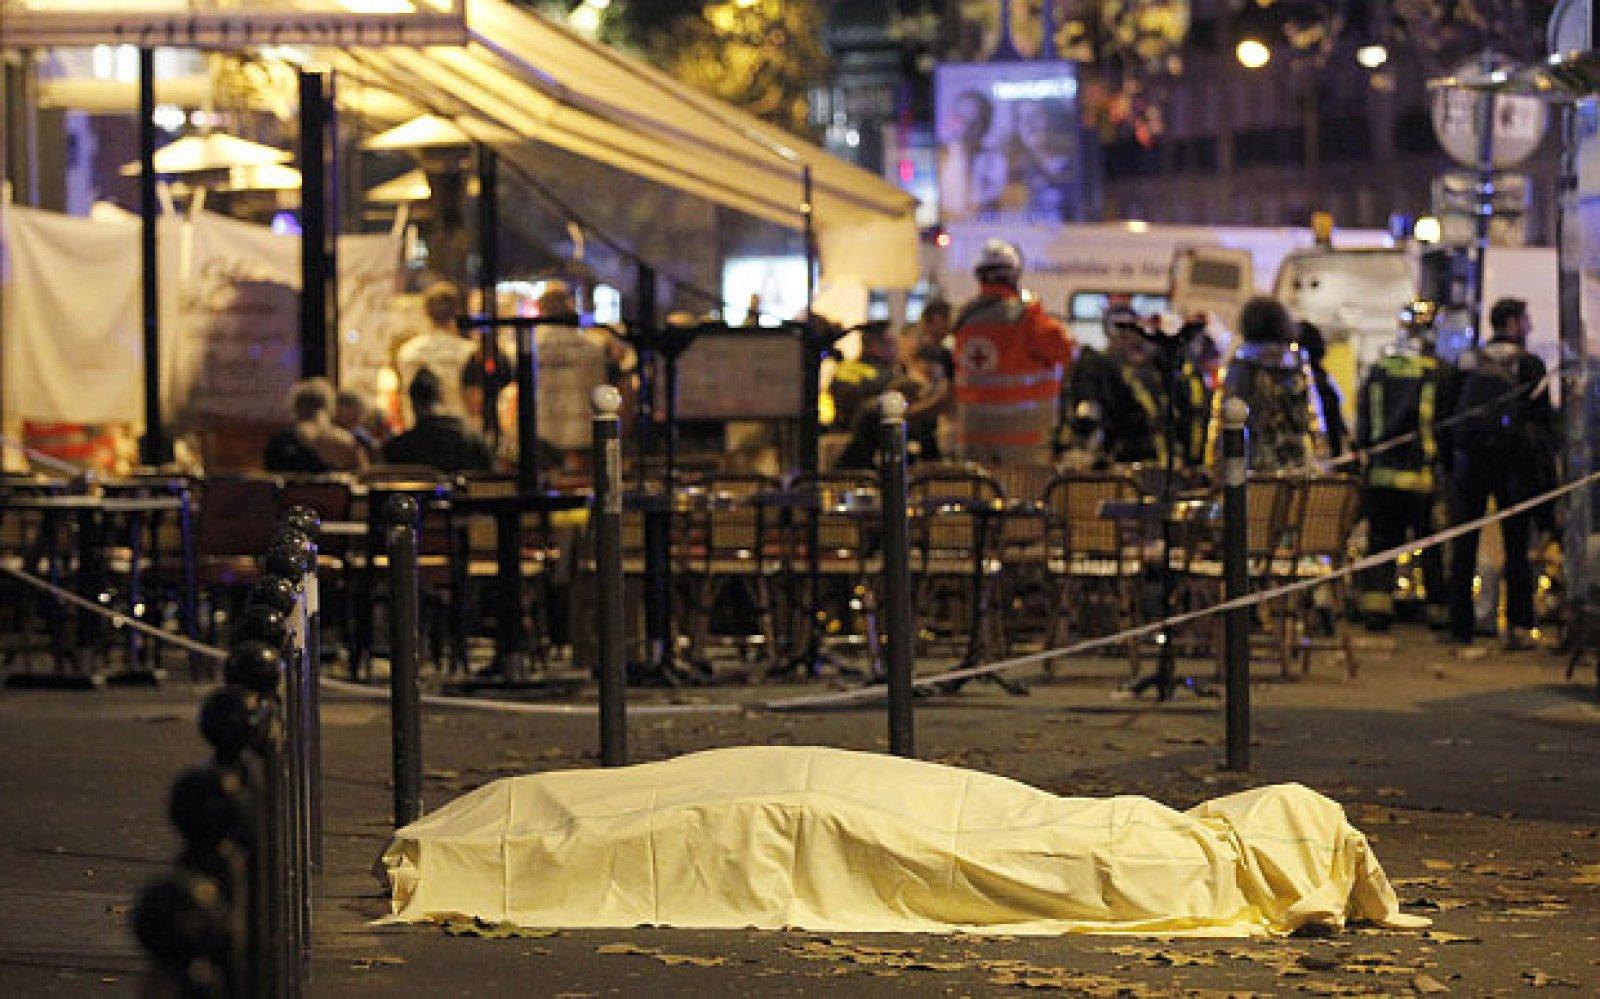 Картинки с терактов в париже